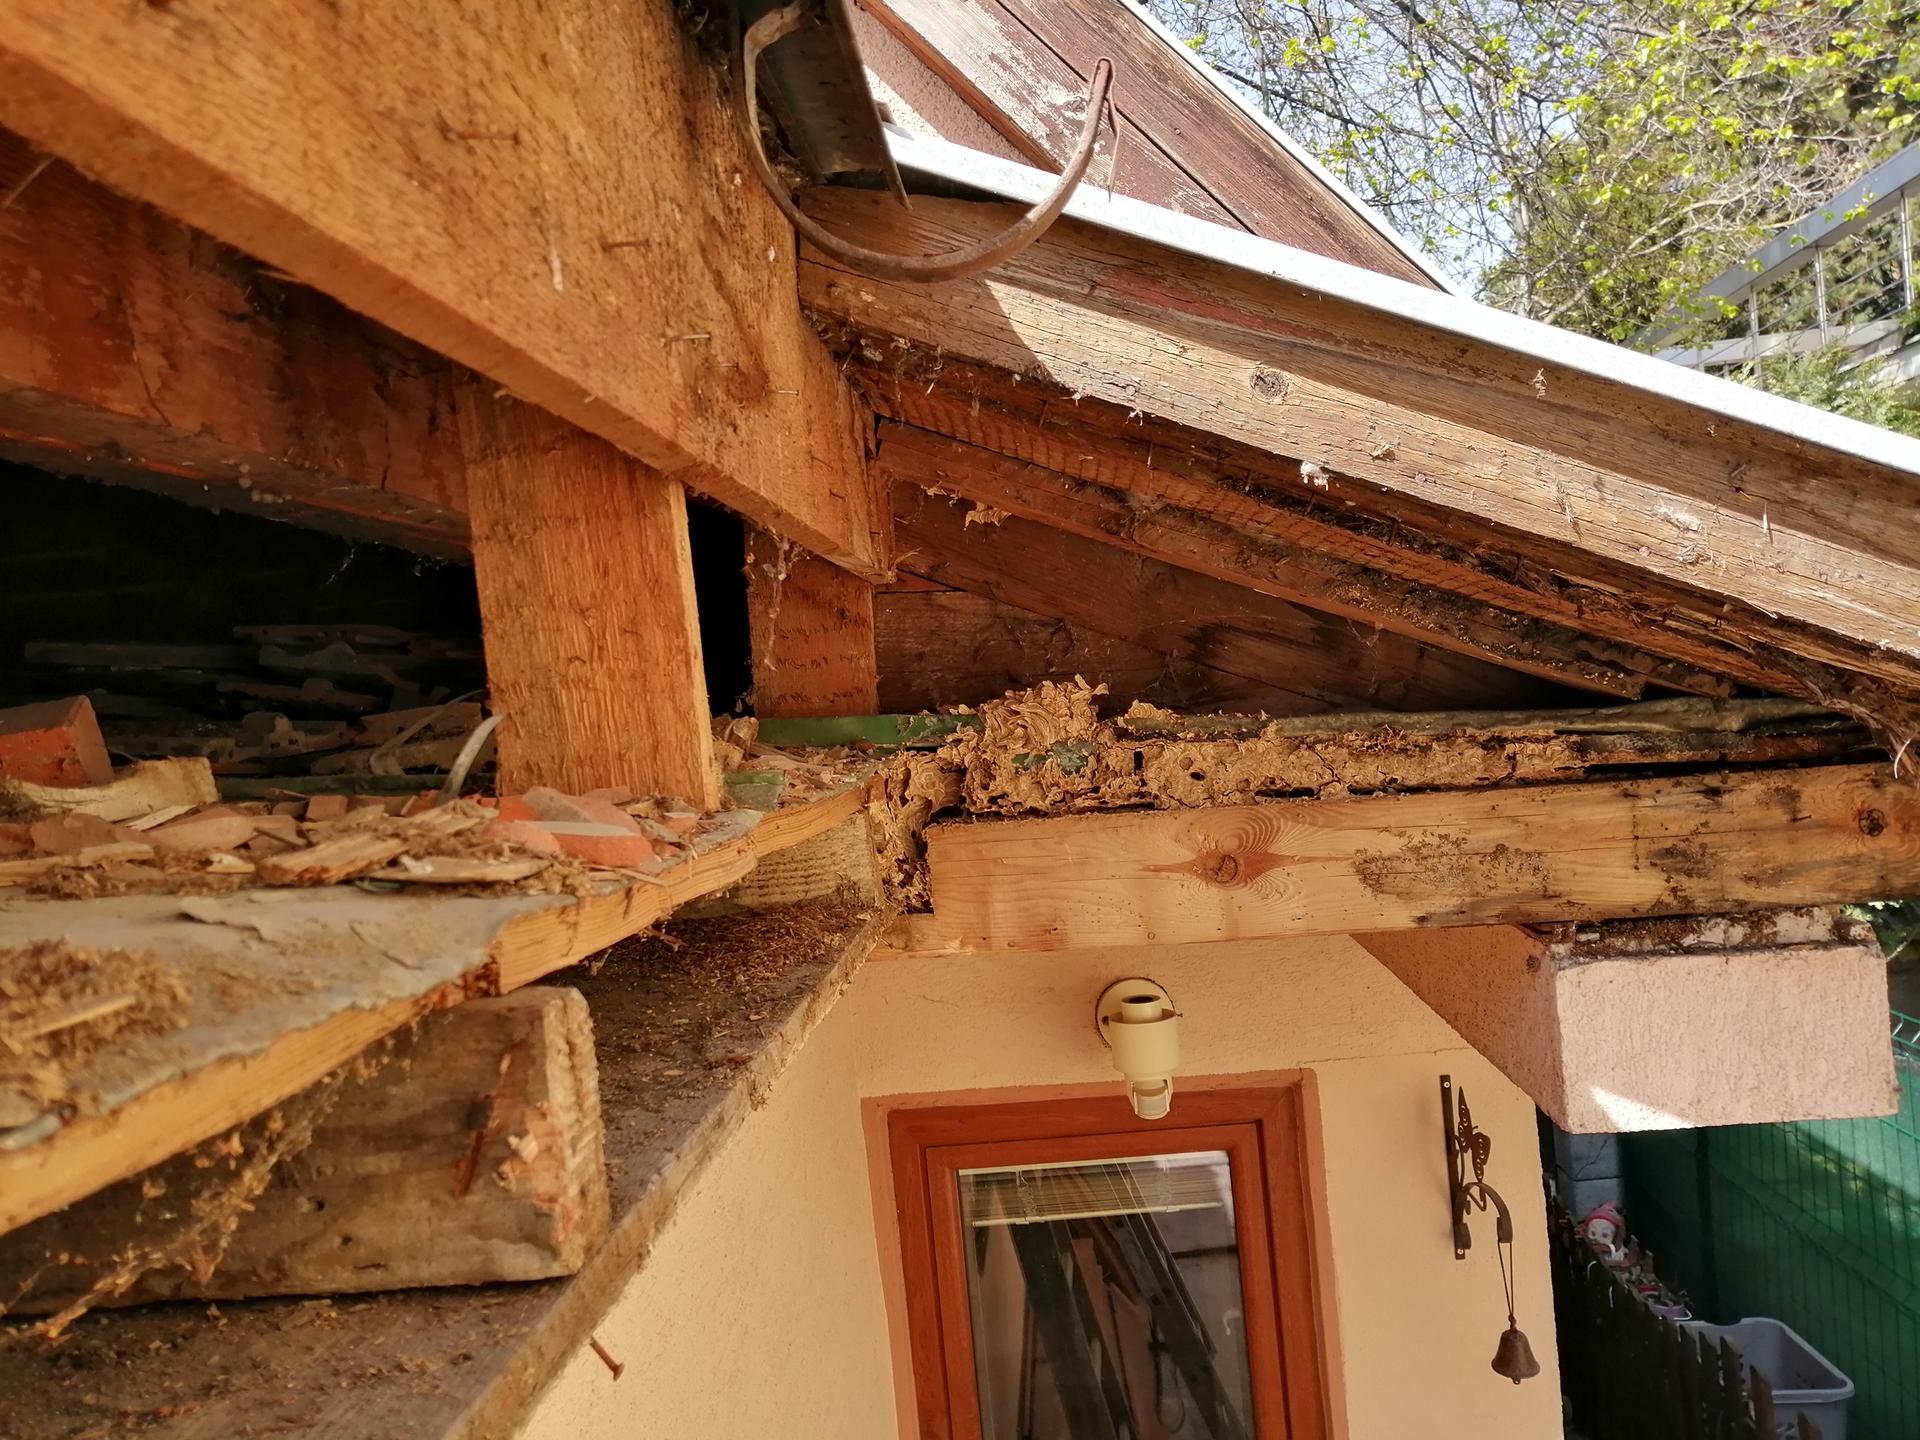 Prestavba podkrovia zo sedlovo valbovej na sedlovú strechu. - Obrázok č. 41